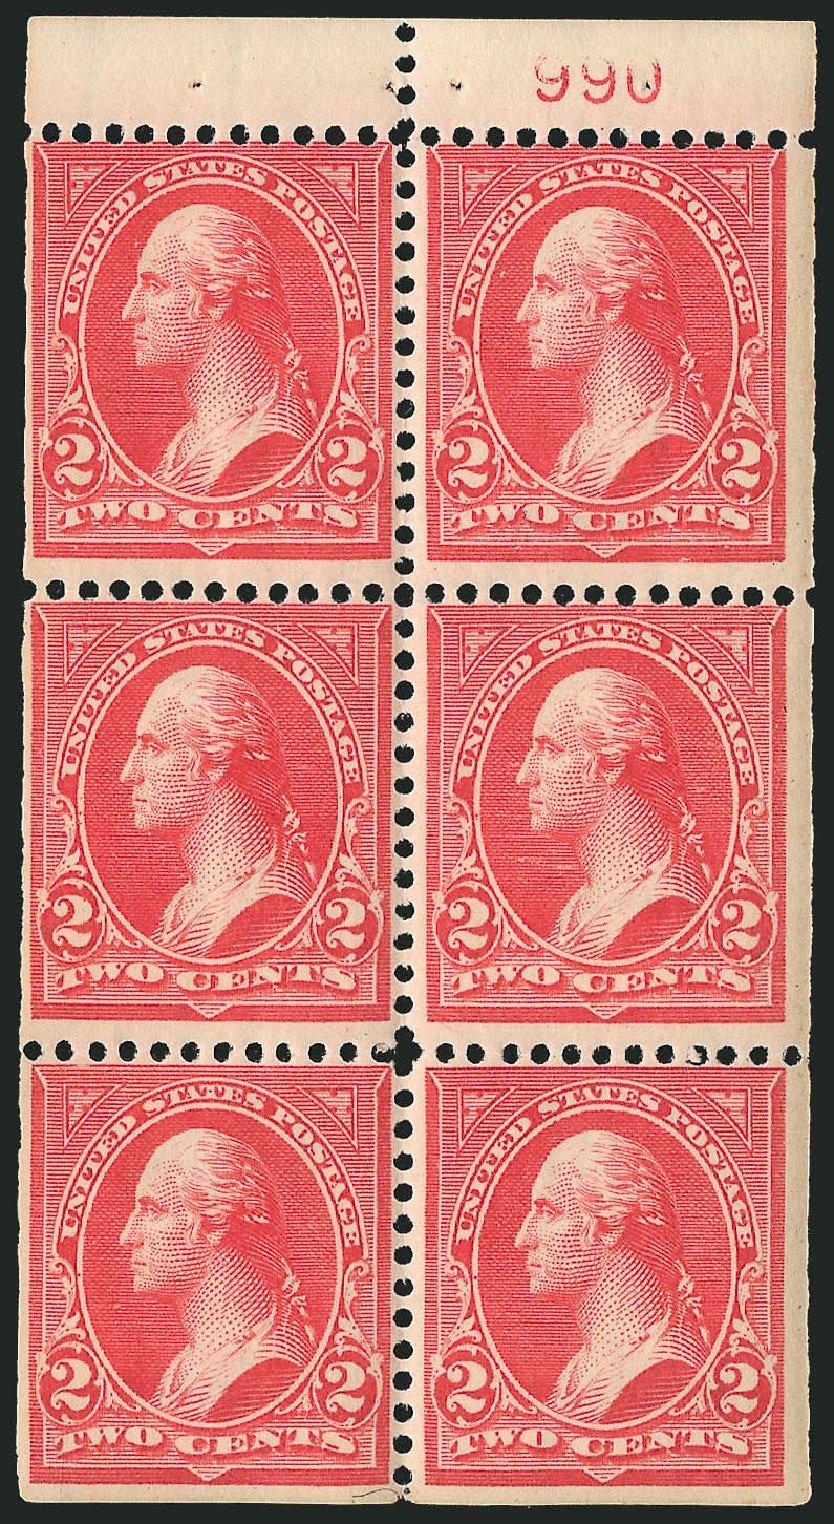 US Stamps Values Scott Cat. 279B: 1897 2c Washington. Robert Siegel Auction Galleries, Mar 2014, Sale 1067, Lot 1295